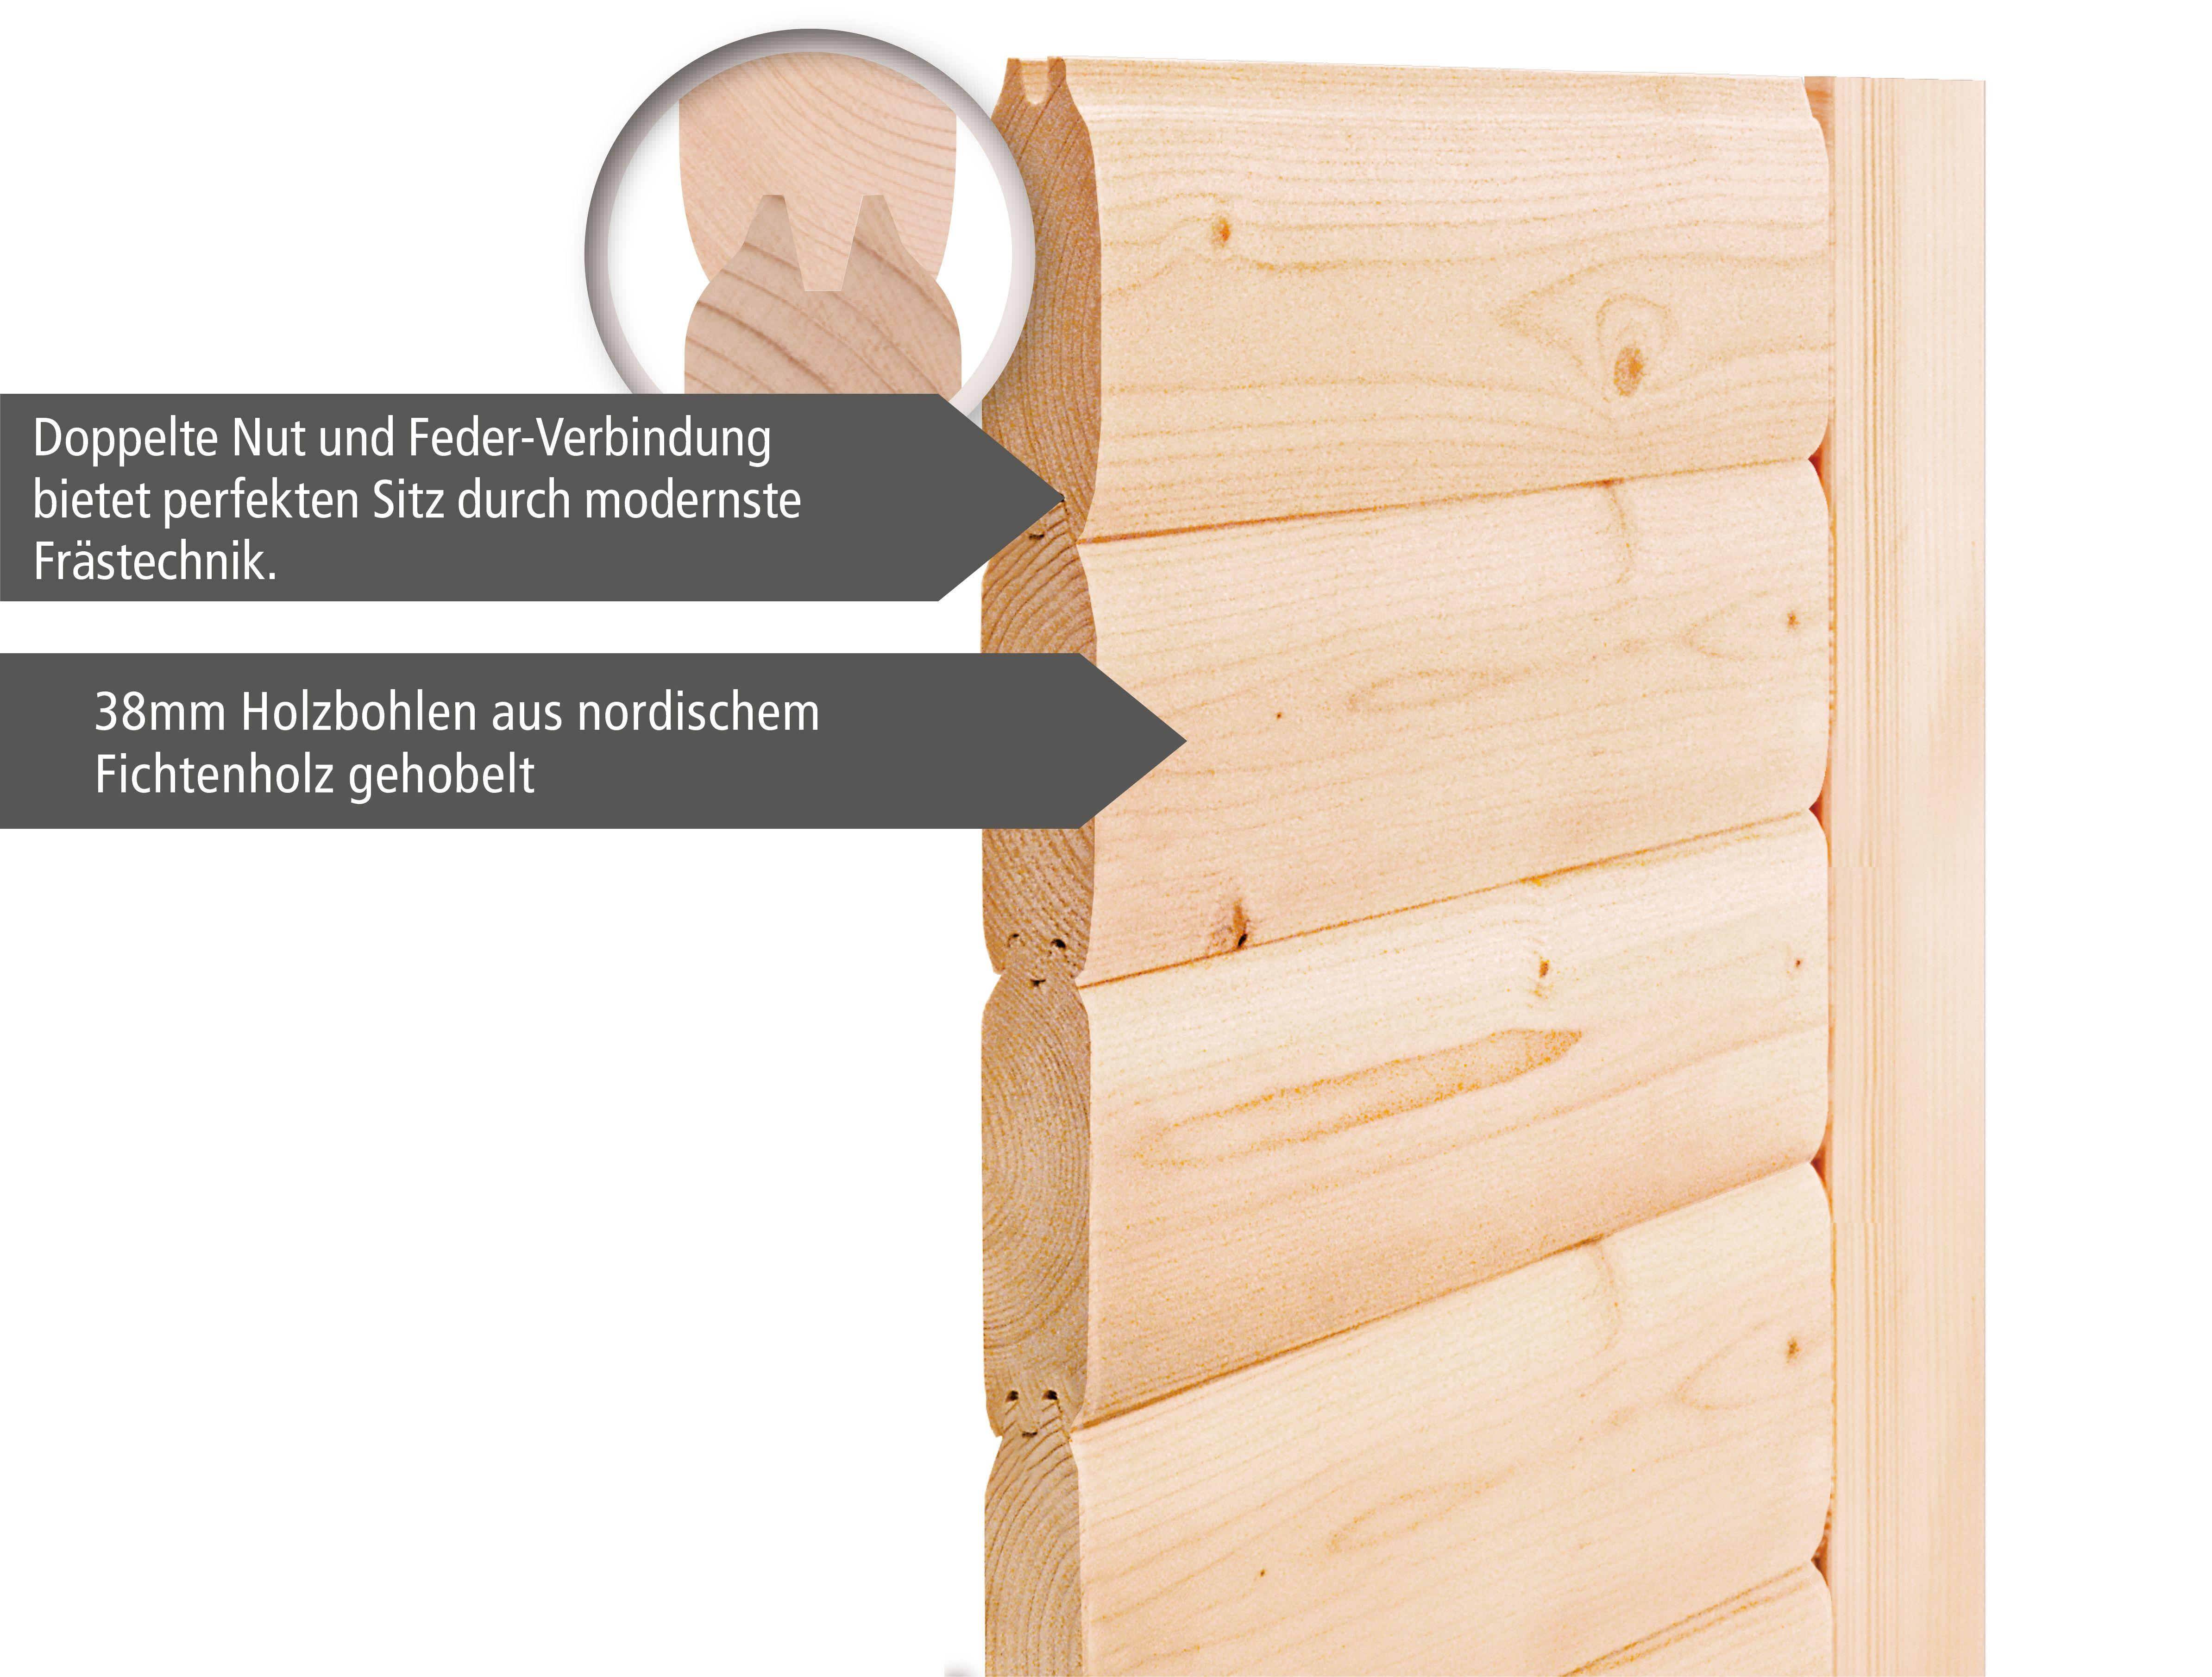 Woodfeeling Sauna Tabea 38mm ohne Saunaofen Bild 4